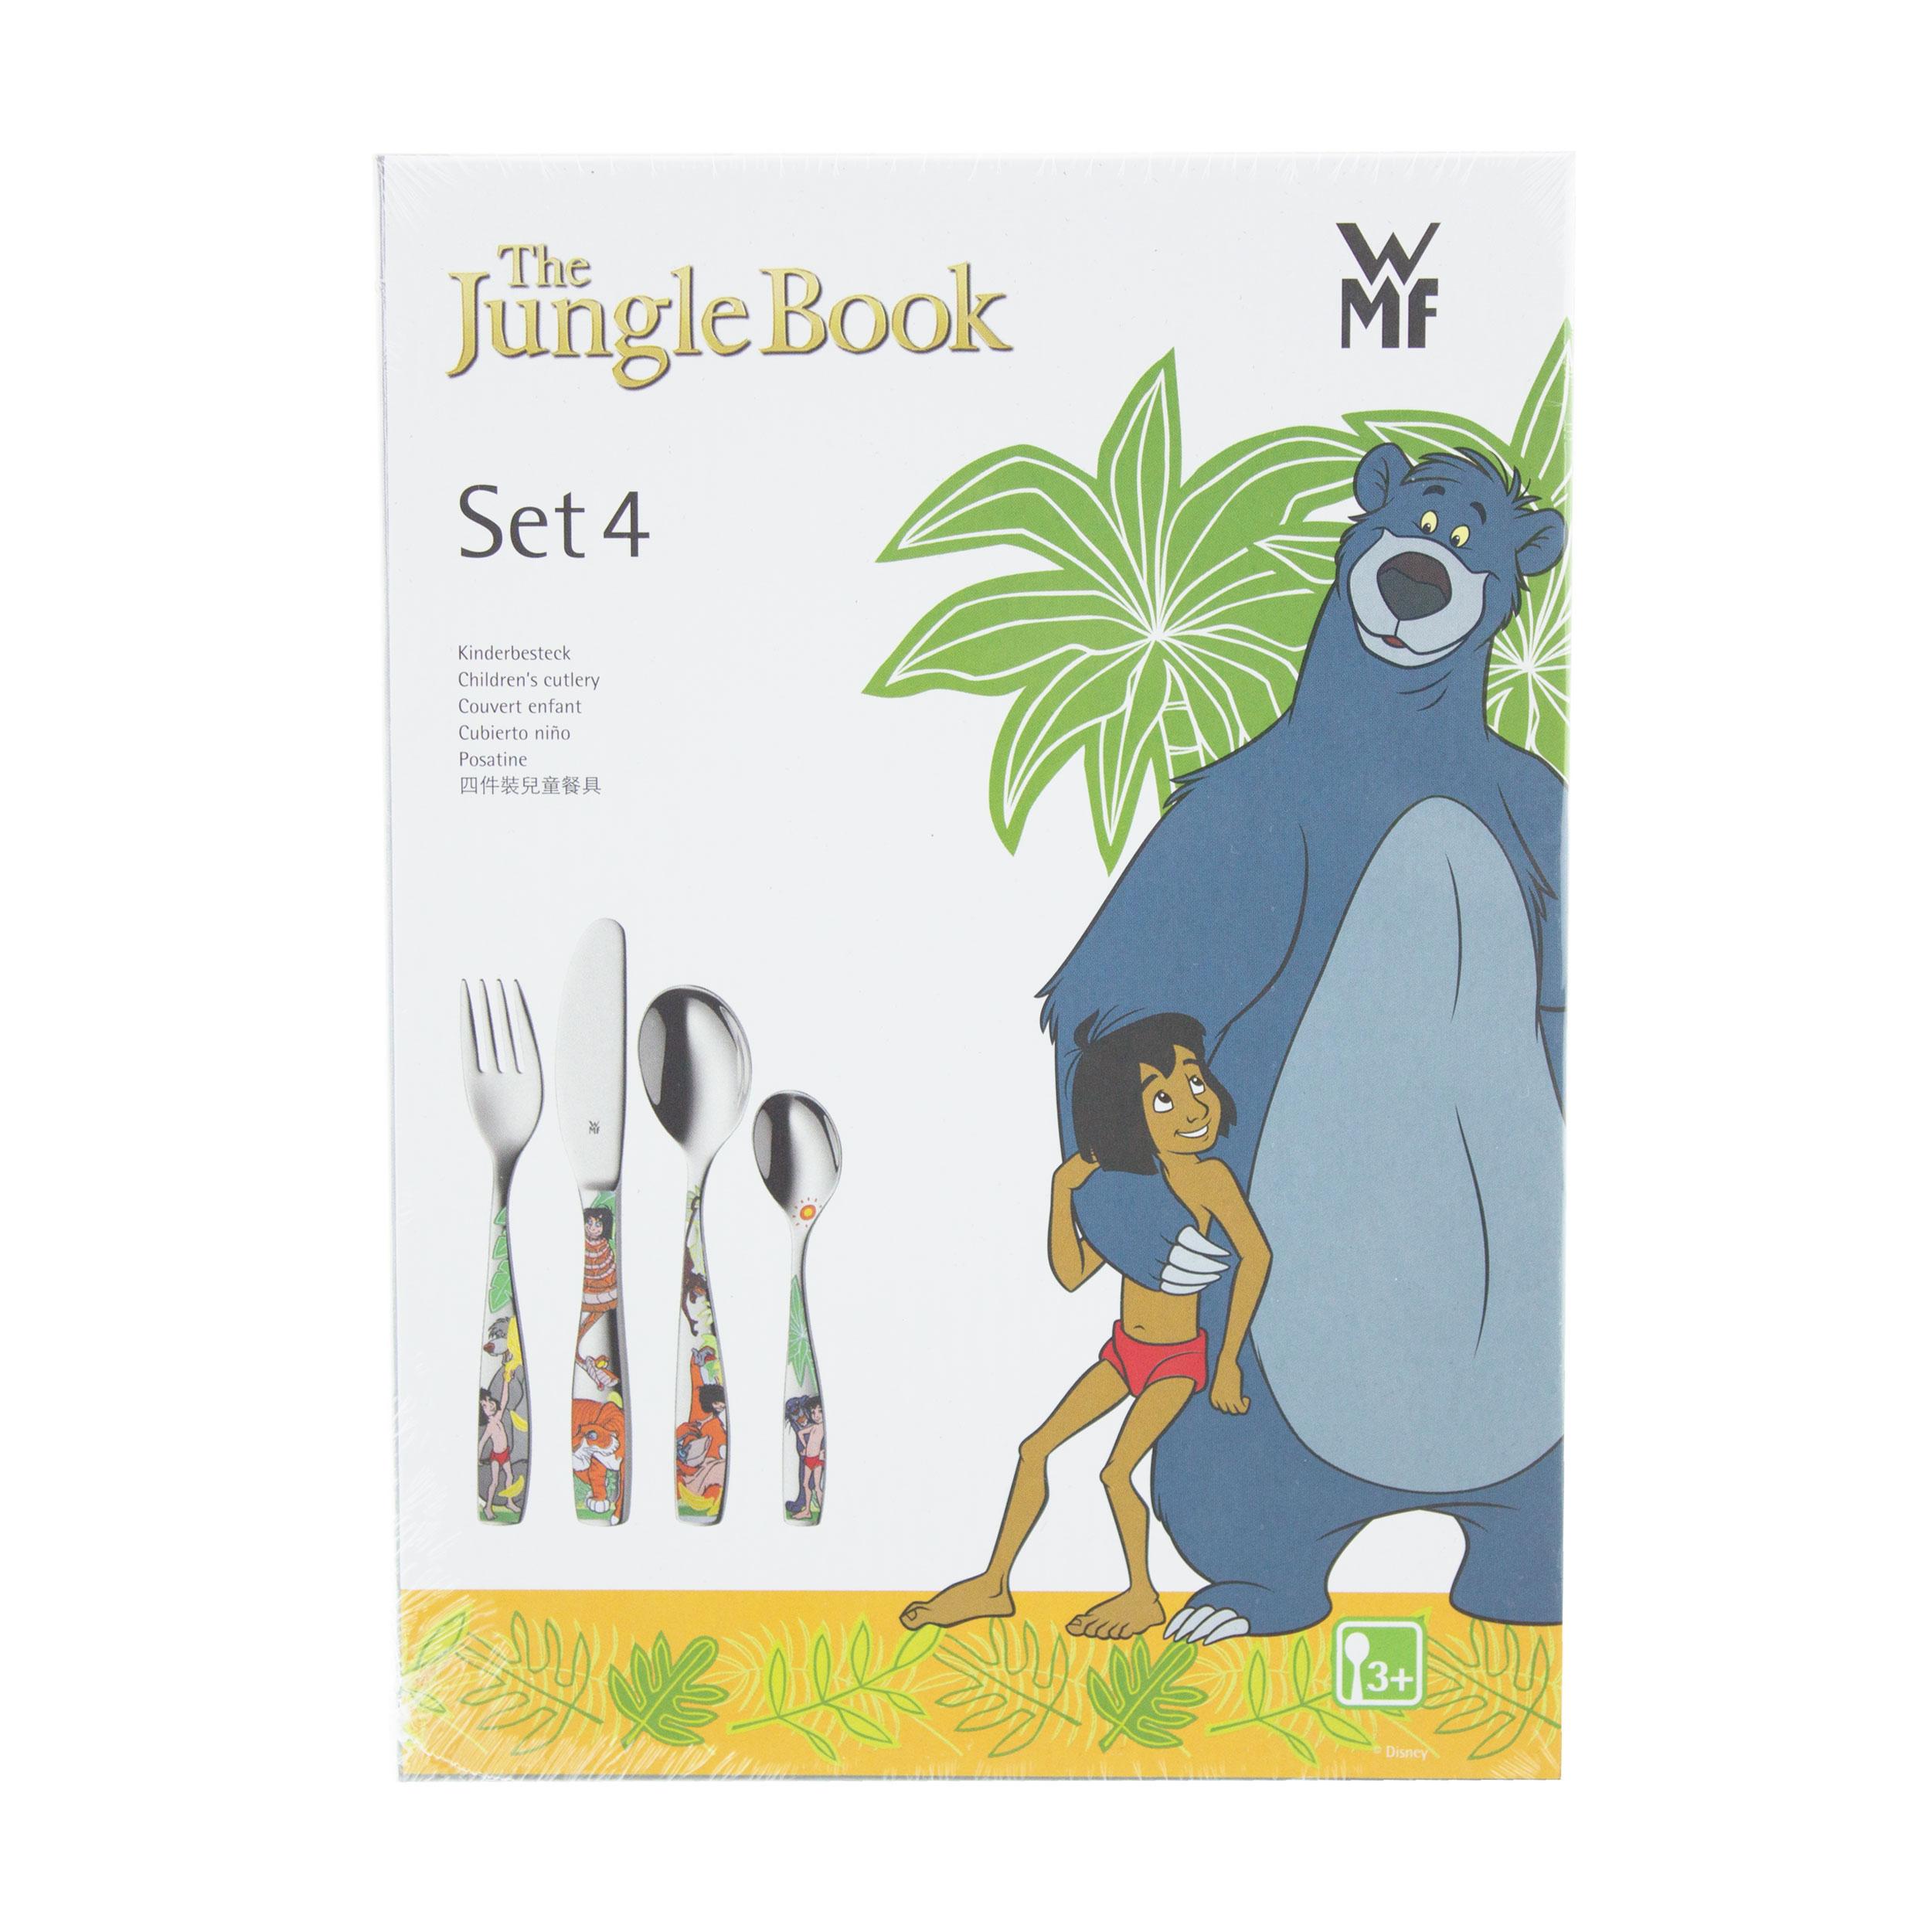 Essbesteck Tafel Besteck Geschirr Edelstahl WMF Kinderbesteck Jungle Book 4-tlg